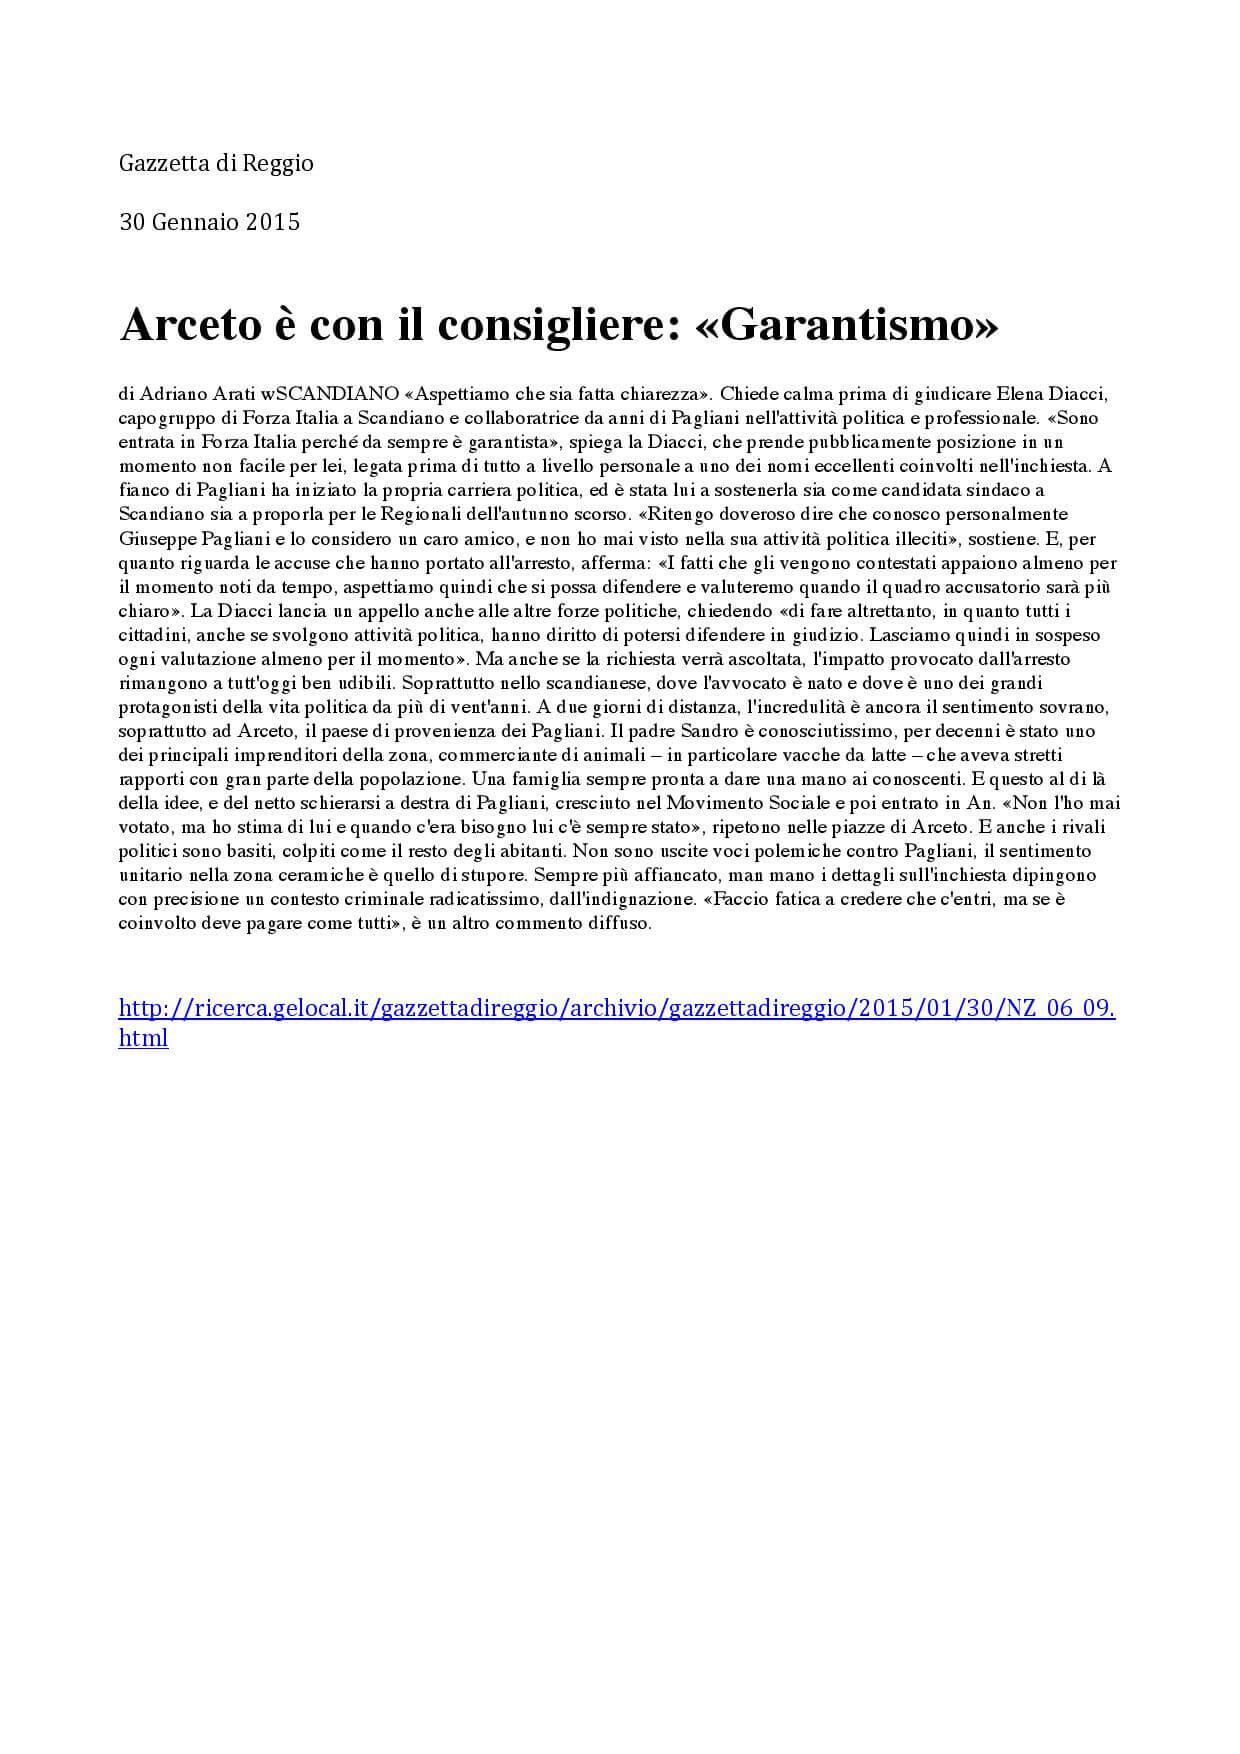 30_1_15_gdr_arceto-page-001